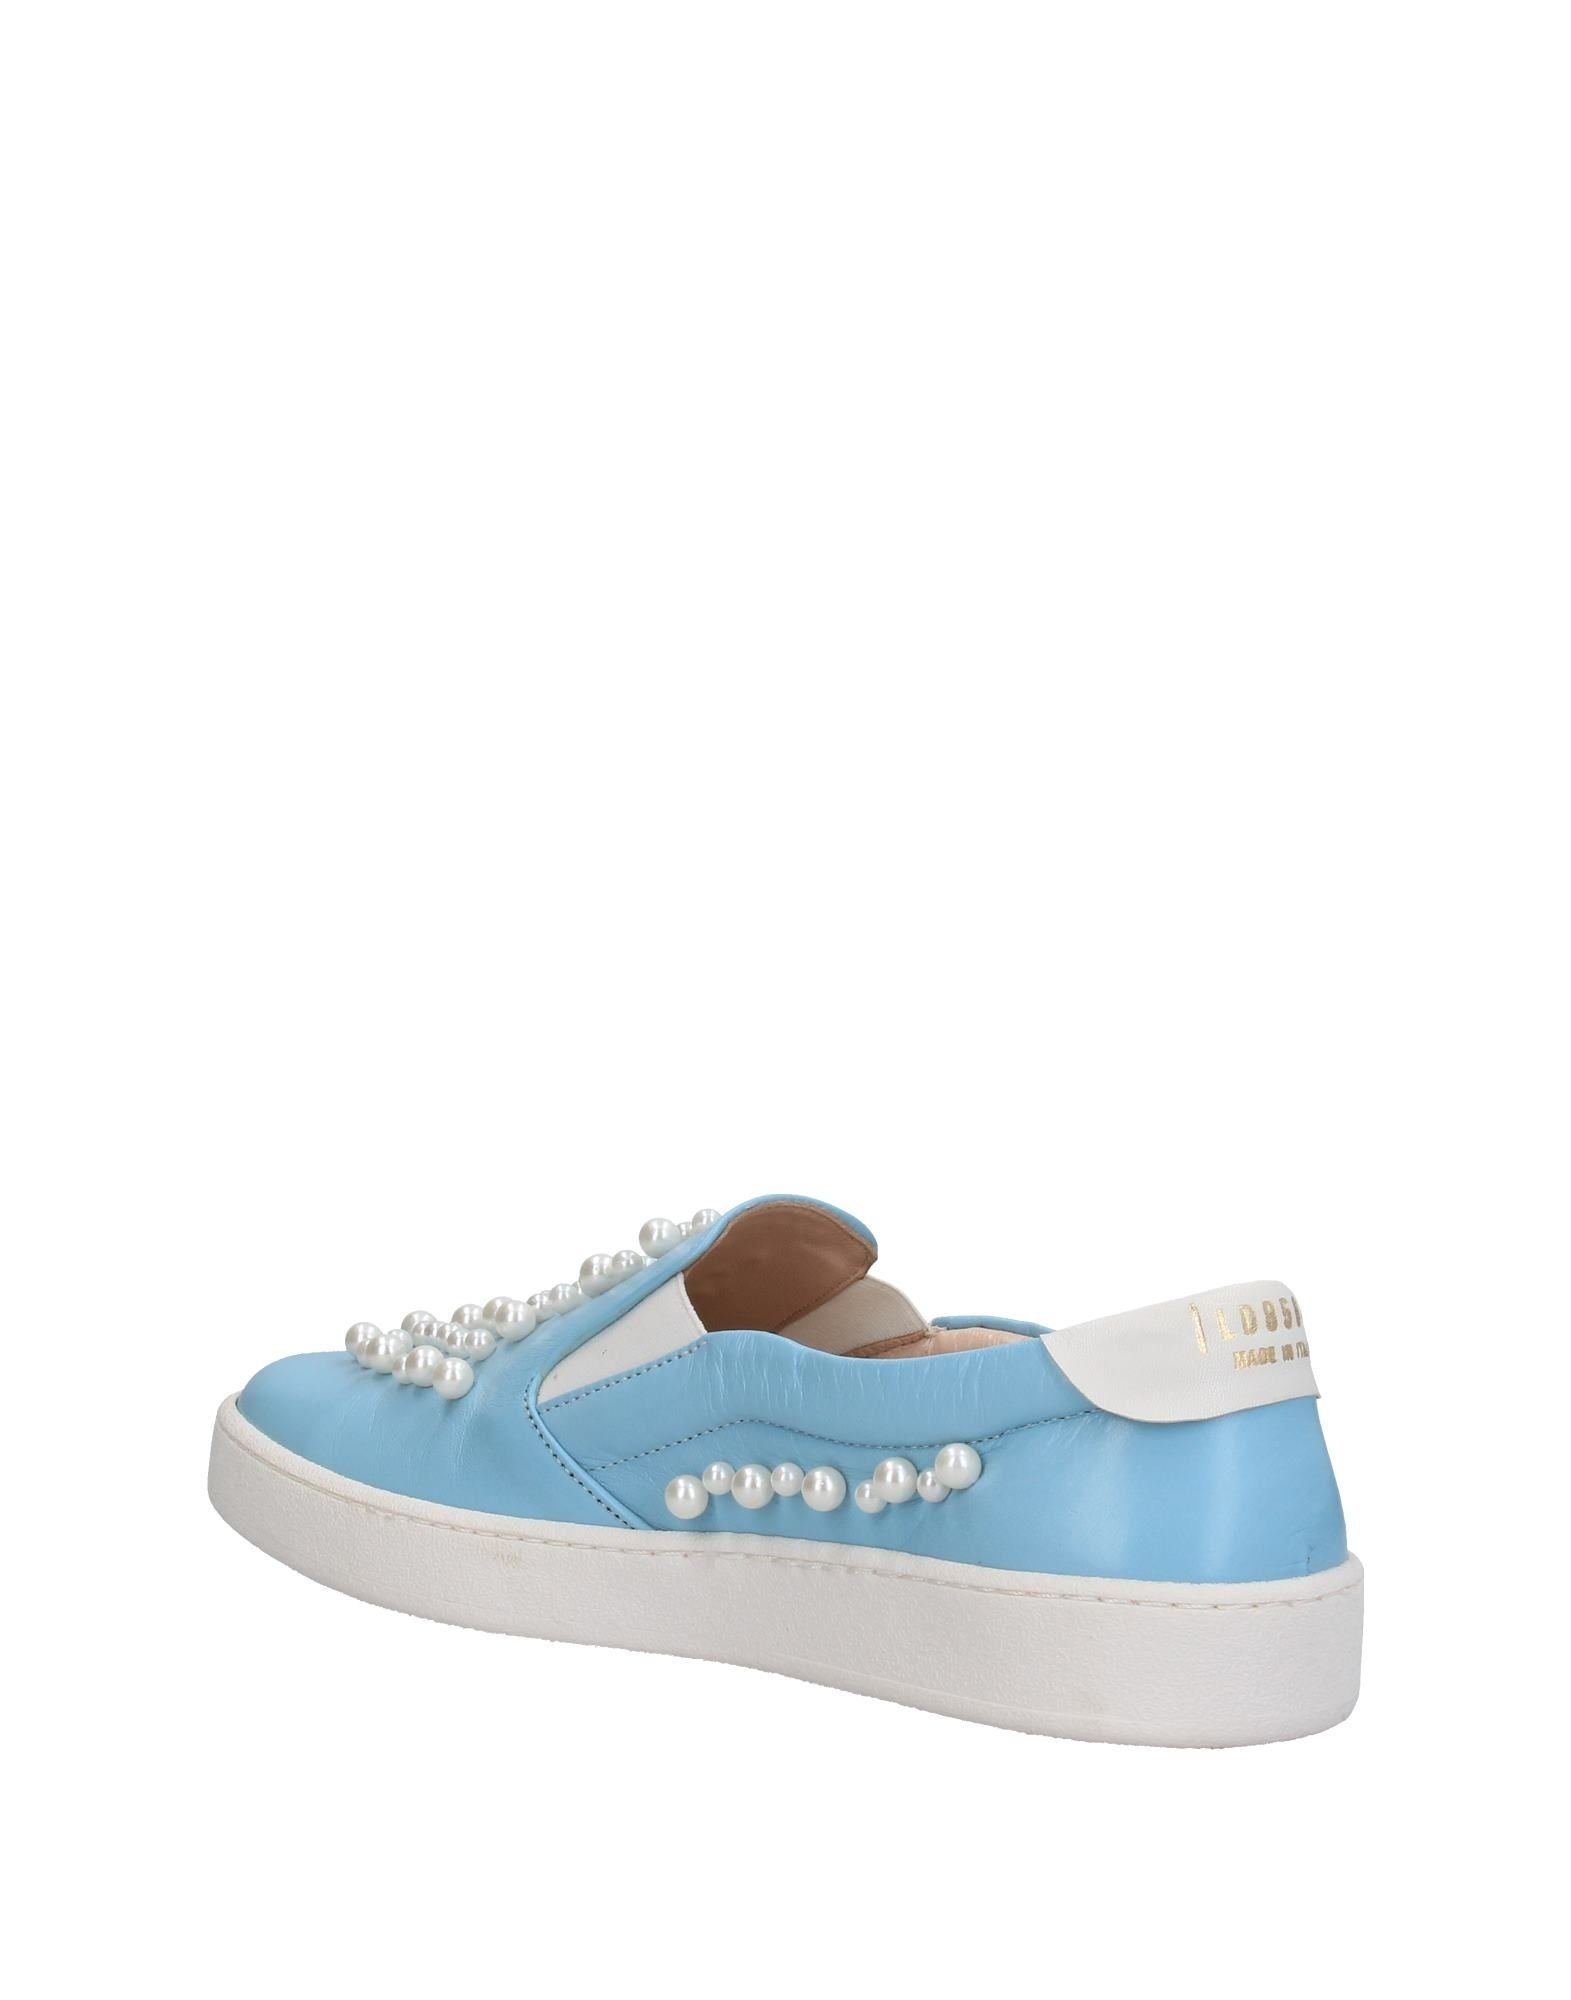 Sneakers Ld8564 Femme - Sneakers Ld8564 sur